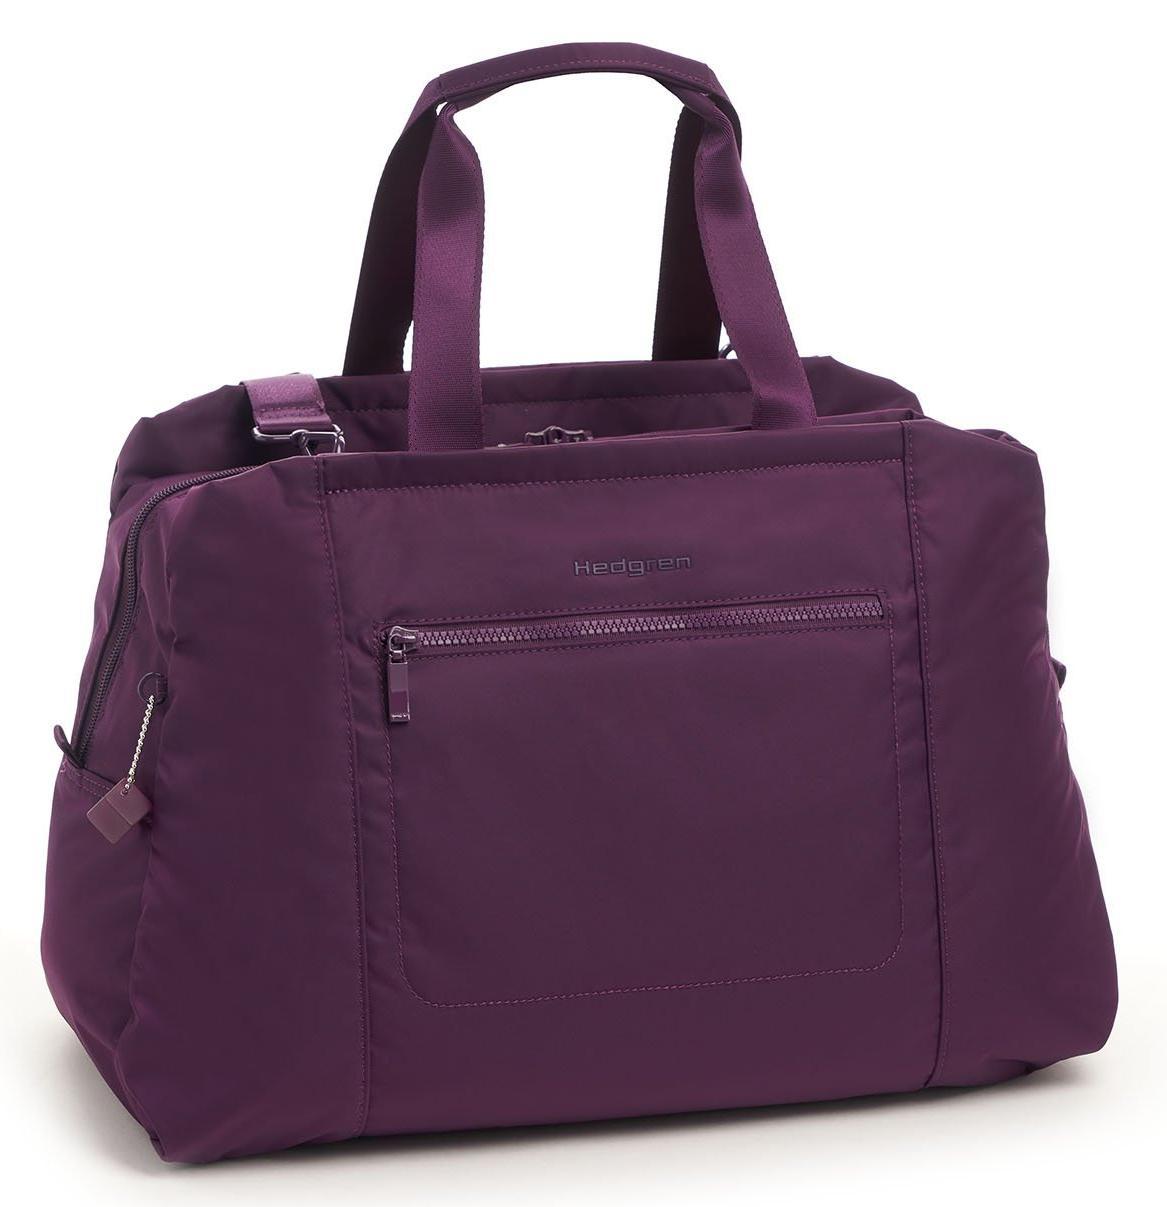 Дорожная сумка Hedgren Inter-City Duffle Bag Stroll RFID purple passion 30 x 45 x 17,5 см фото